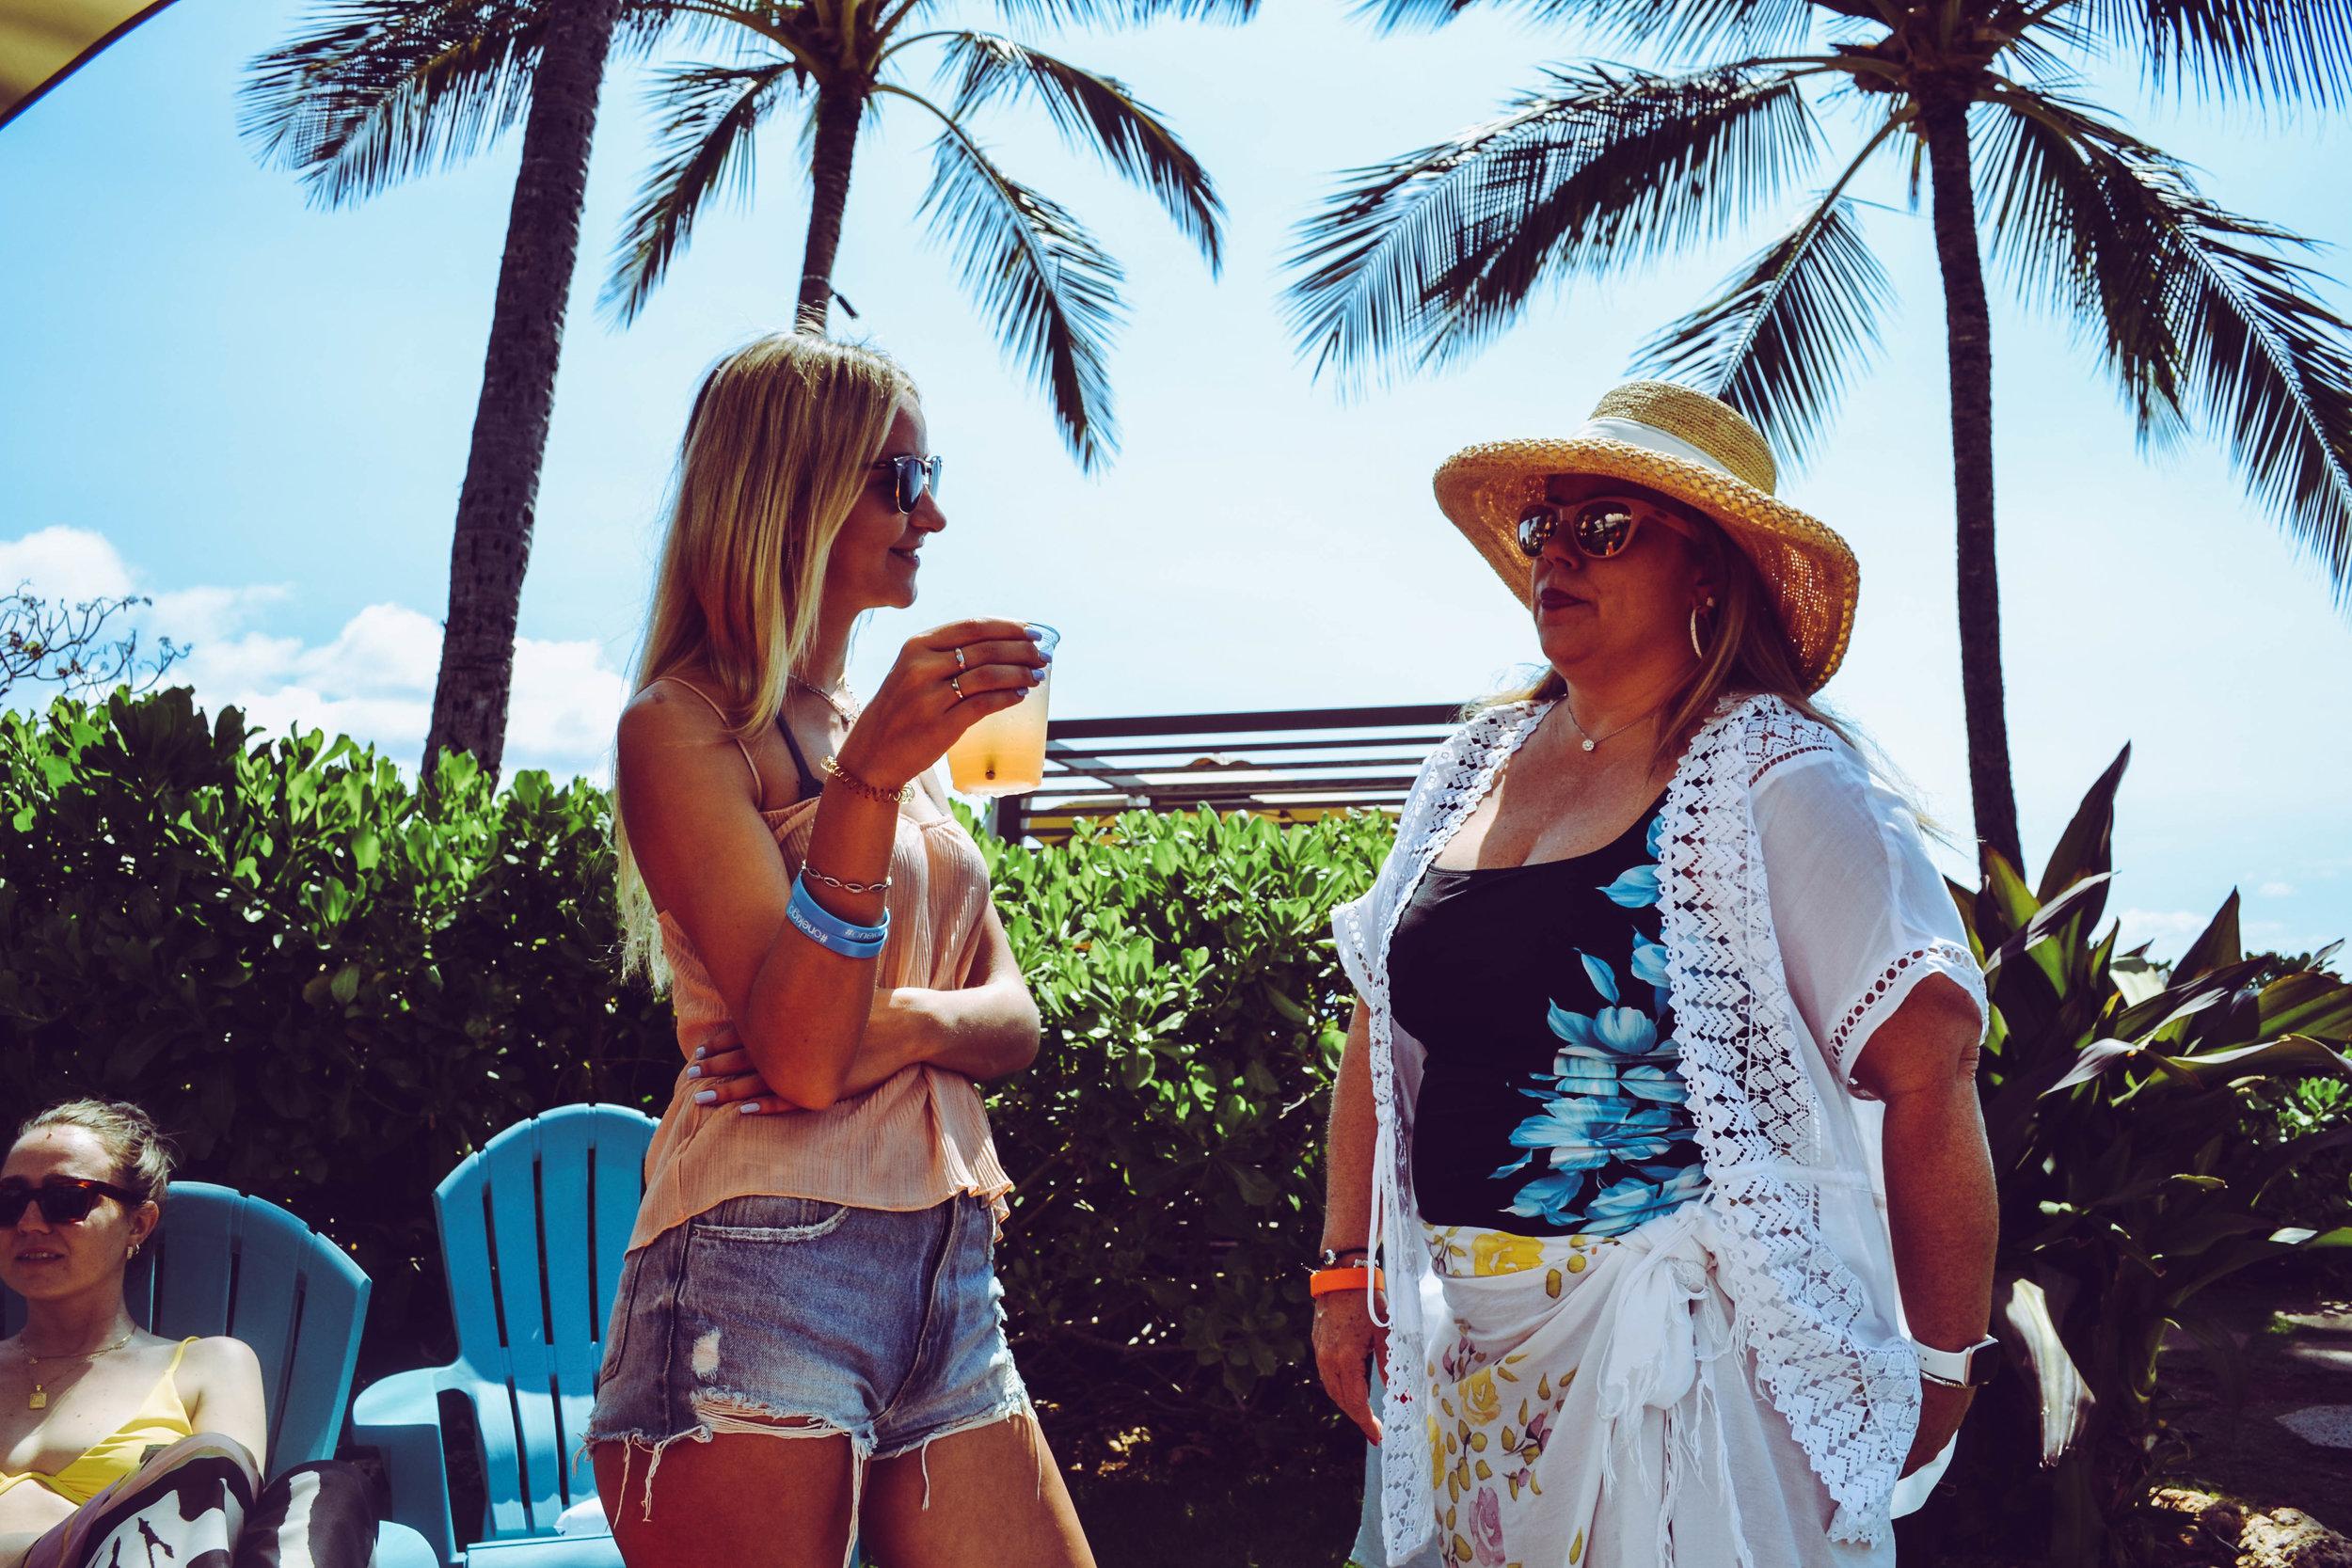 picnic networking.  four seasons. hawaii.